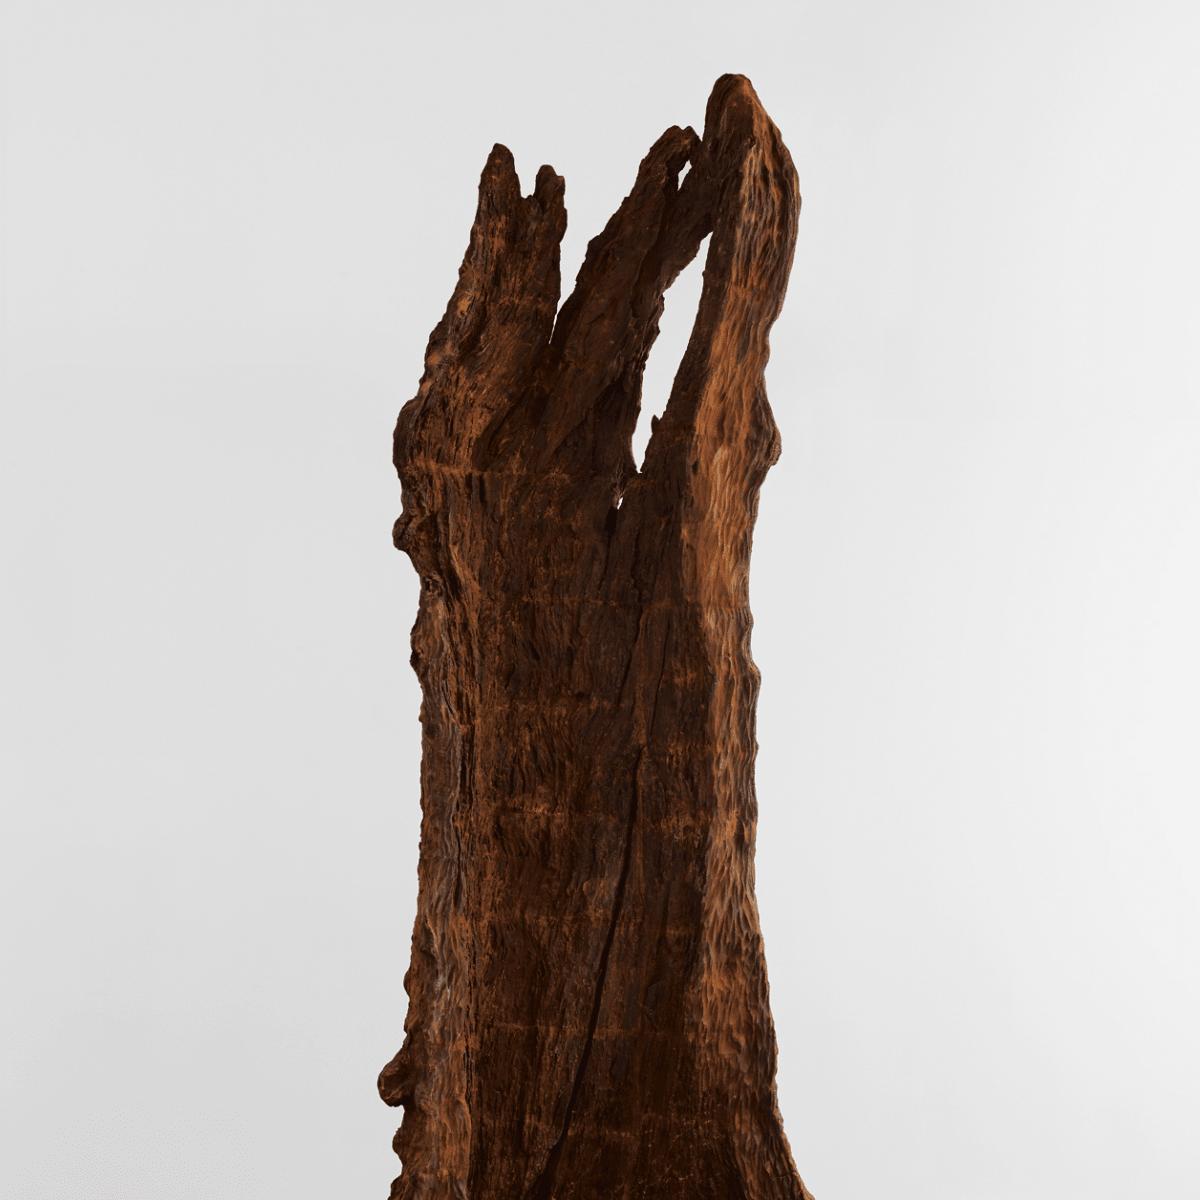 Iron Tree Trunk 2015 by Ai Weiwei